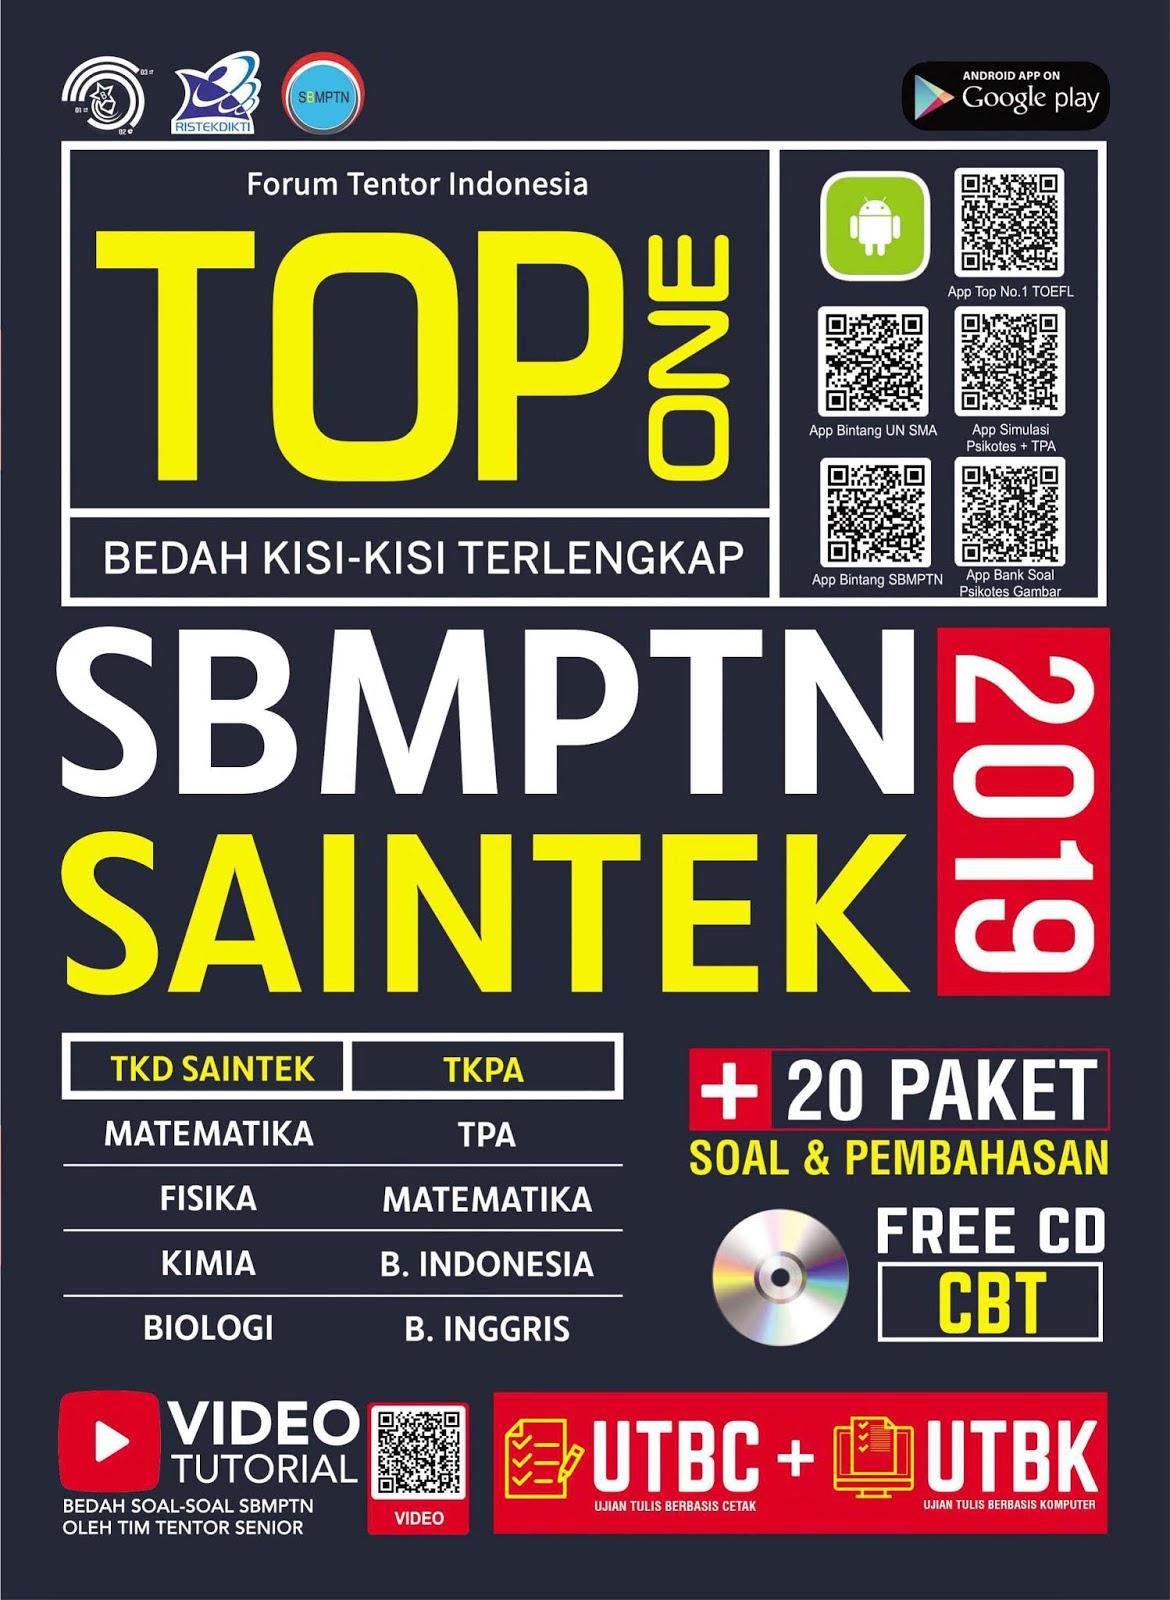 TOP One Bedah Kisi-kisi Terlengkap SBMPTN SAINTEK